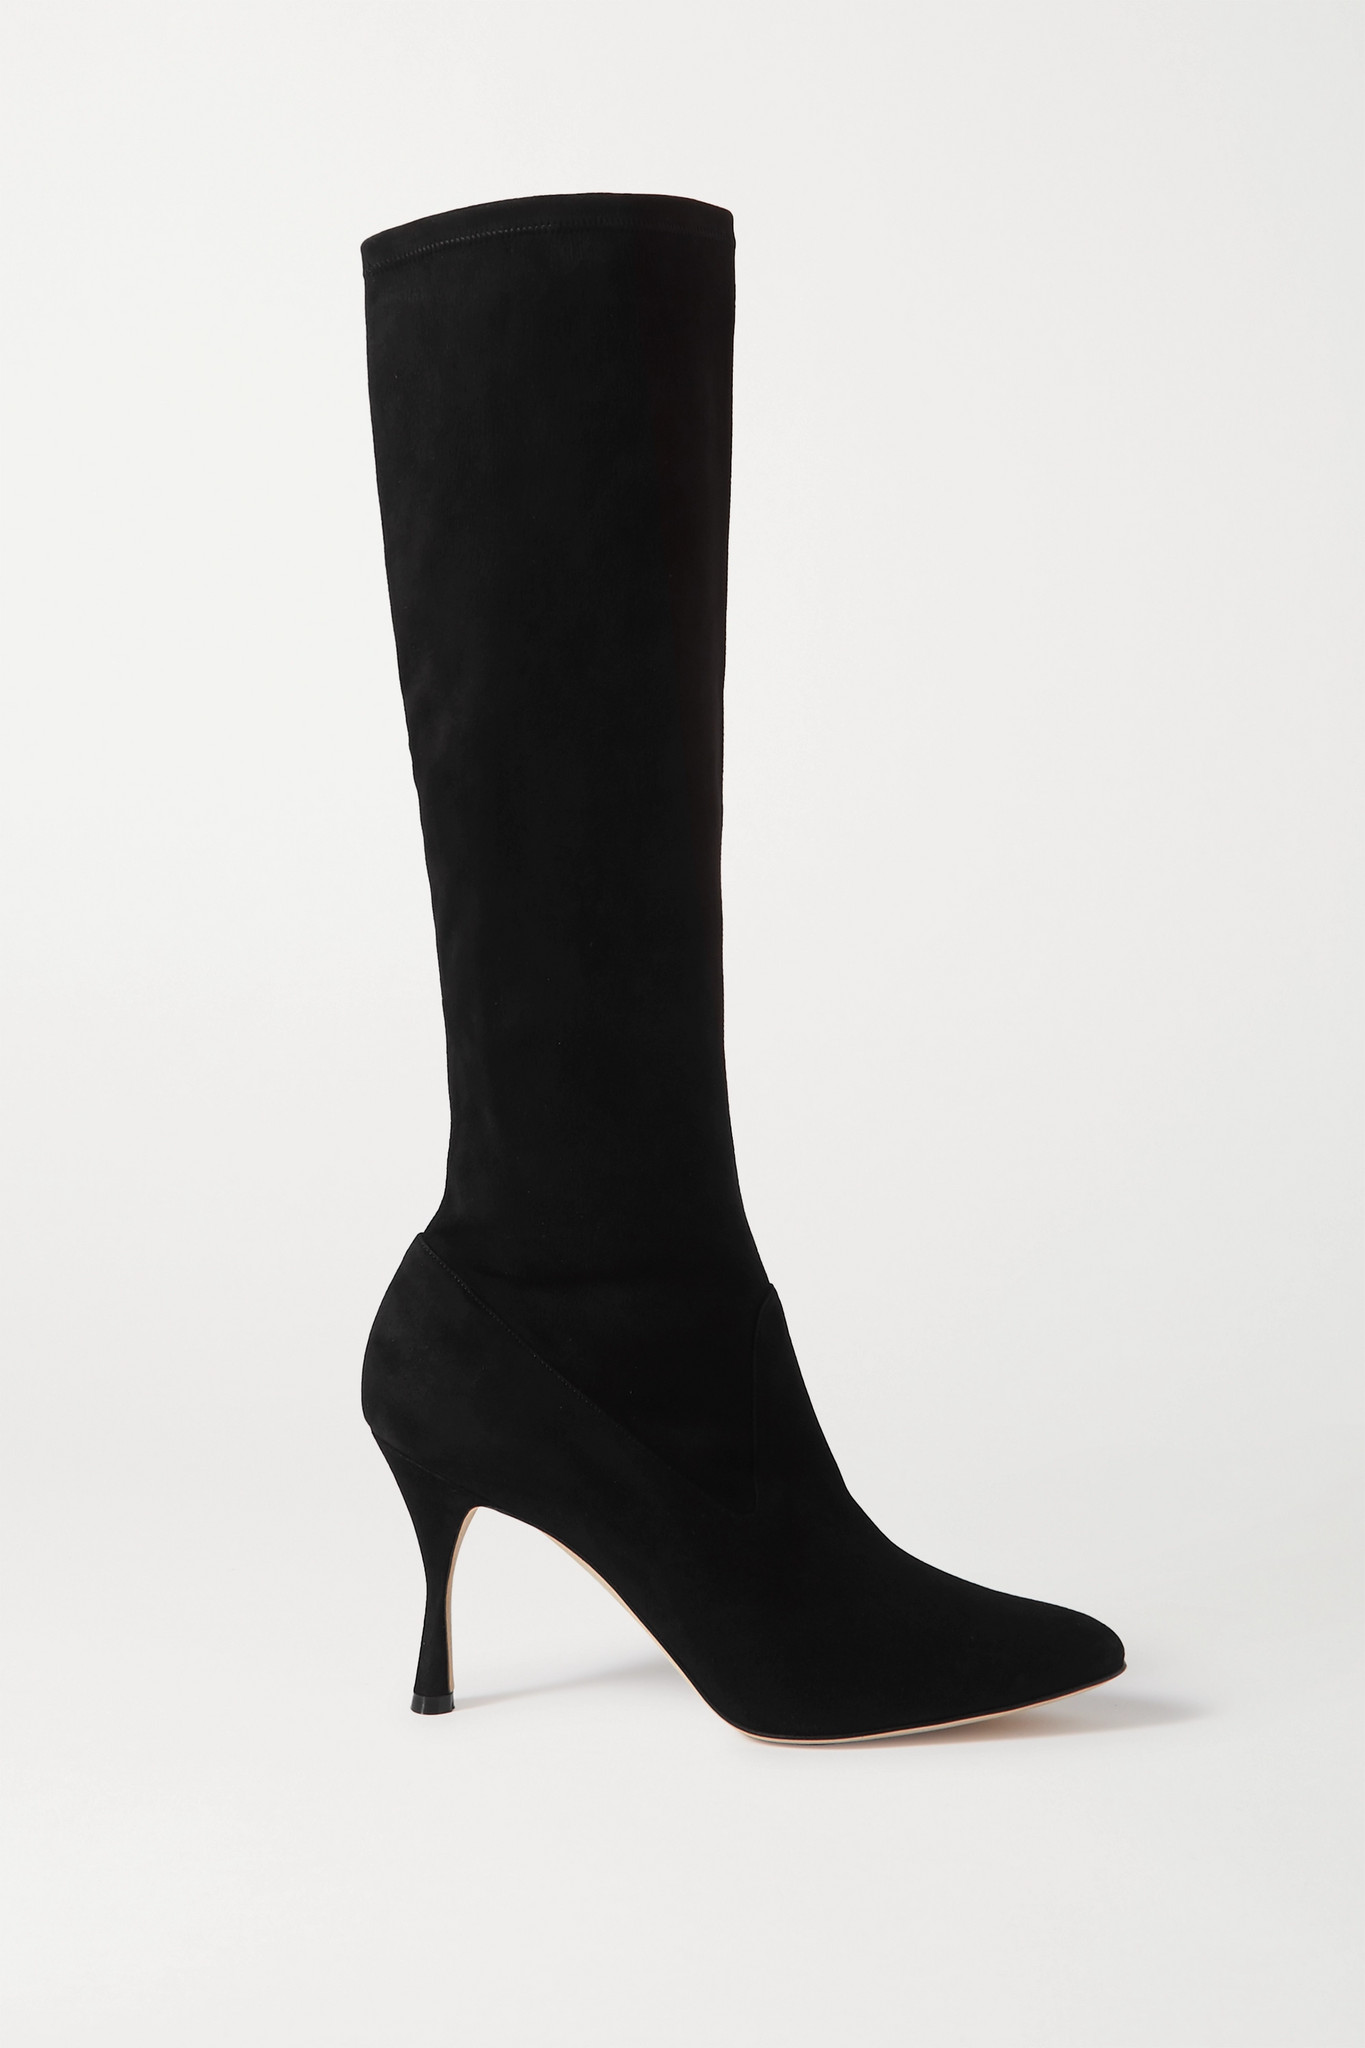 MANOLO BLAHNIK - Pamfilo Stretch-suede Knee Boots - Black - IT39